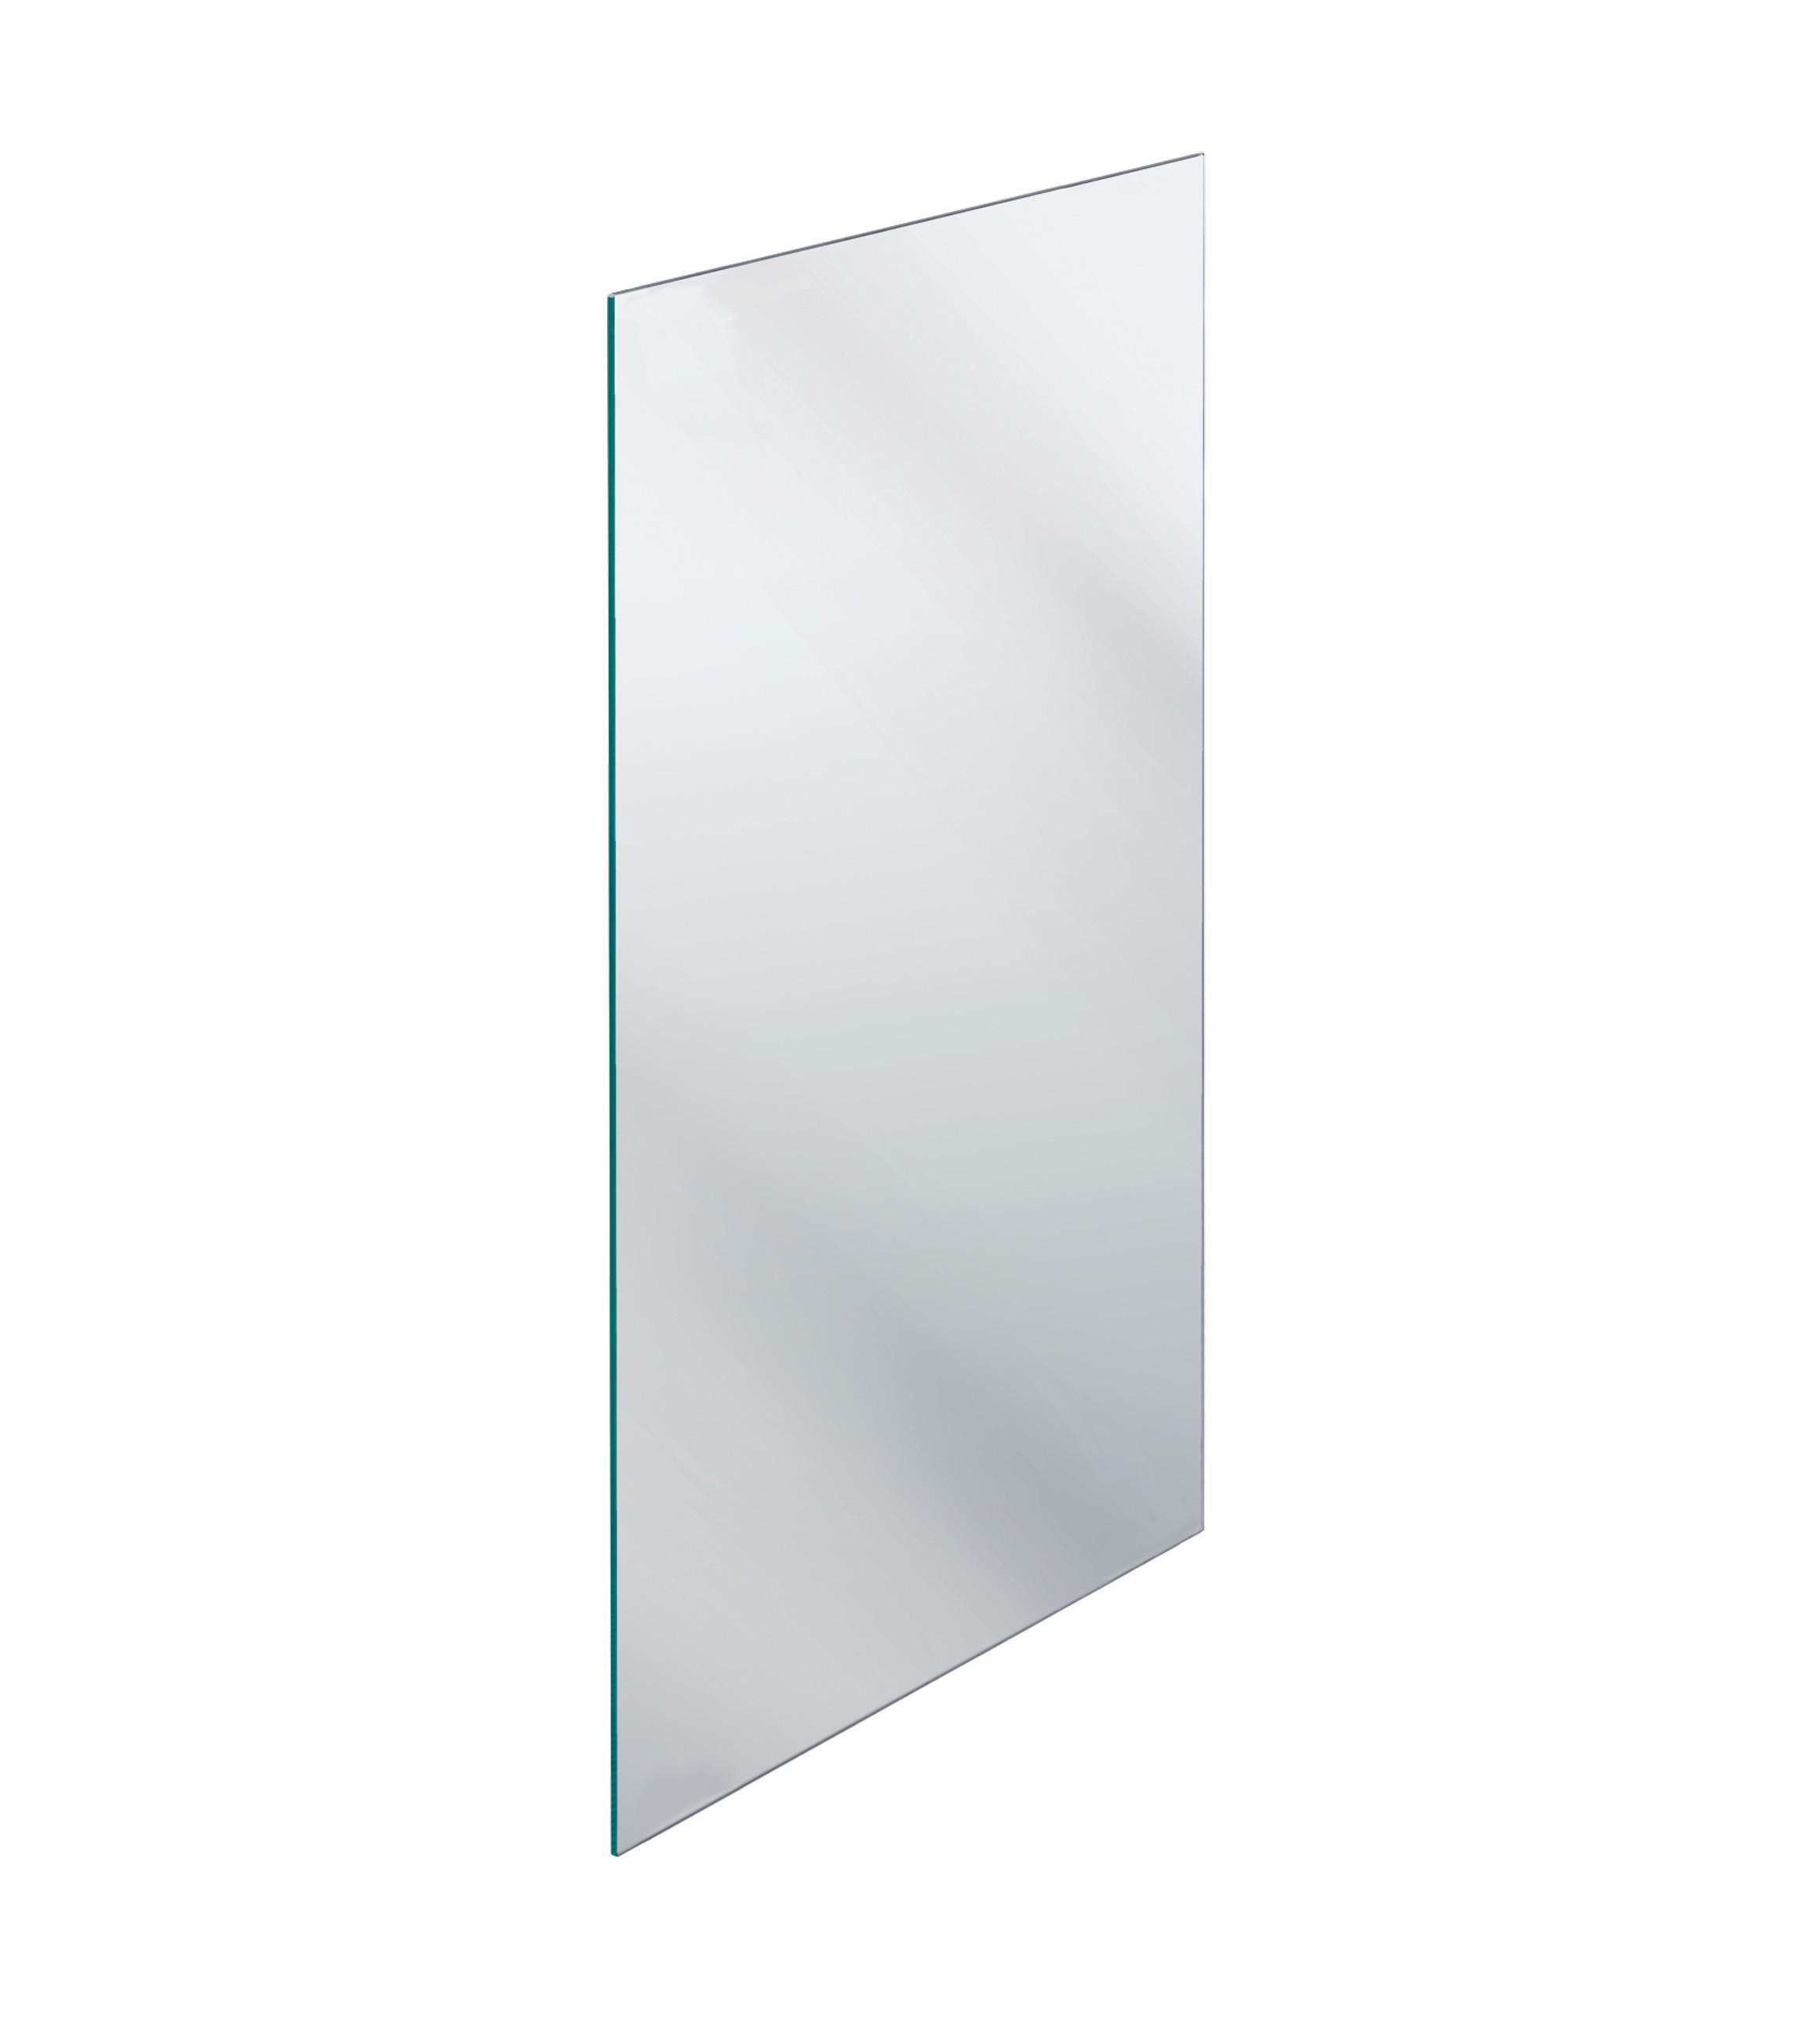 FSB Spiegel 600x600 Edelstahl spiegelpolinksert (0 82 8260 00055 6205)